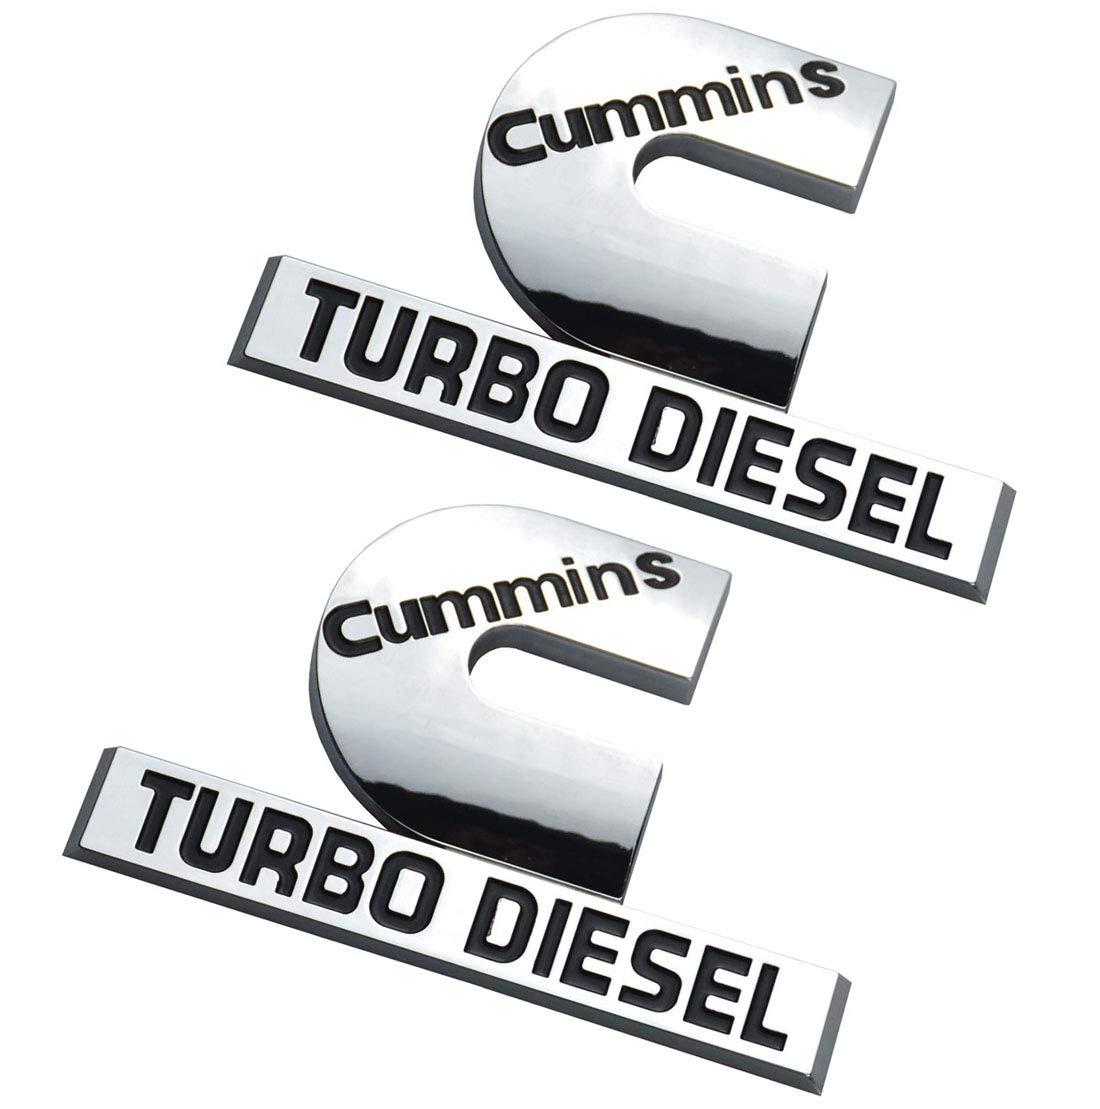 2PCS 4.4Inch Cummins Turbo Diesel Emblem Badge Compatible for Dodge RAM 1500 2500 3500 Chrome